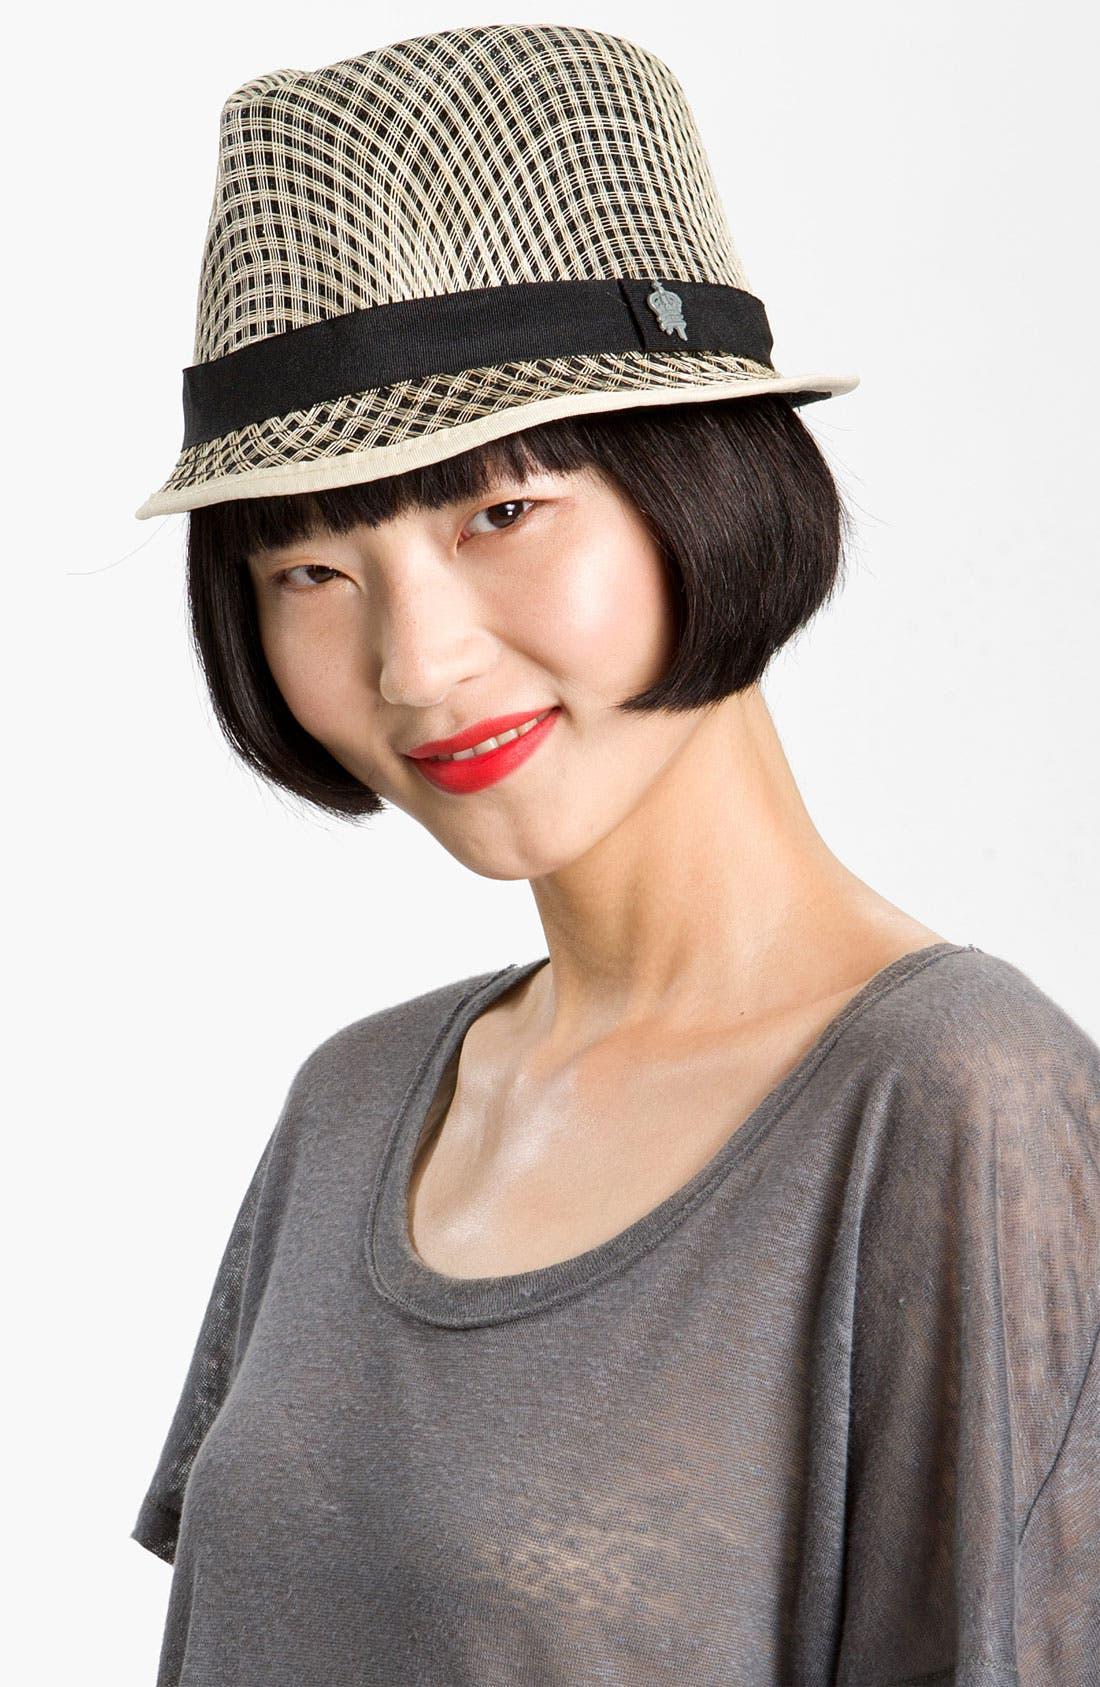 Alternate Image 1 Selected - Christy's Hats 'Paris' Hat